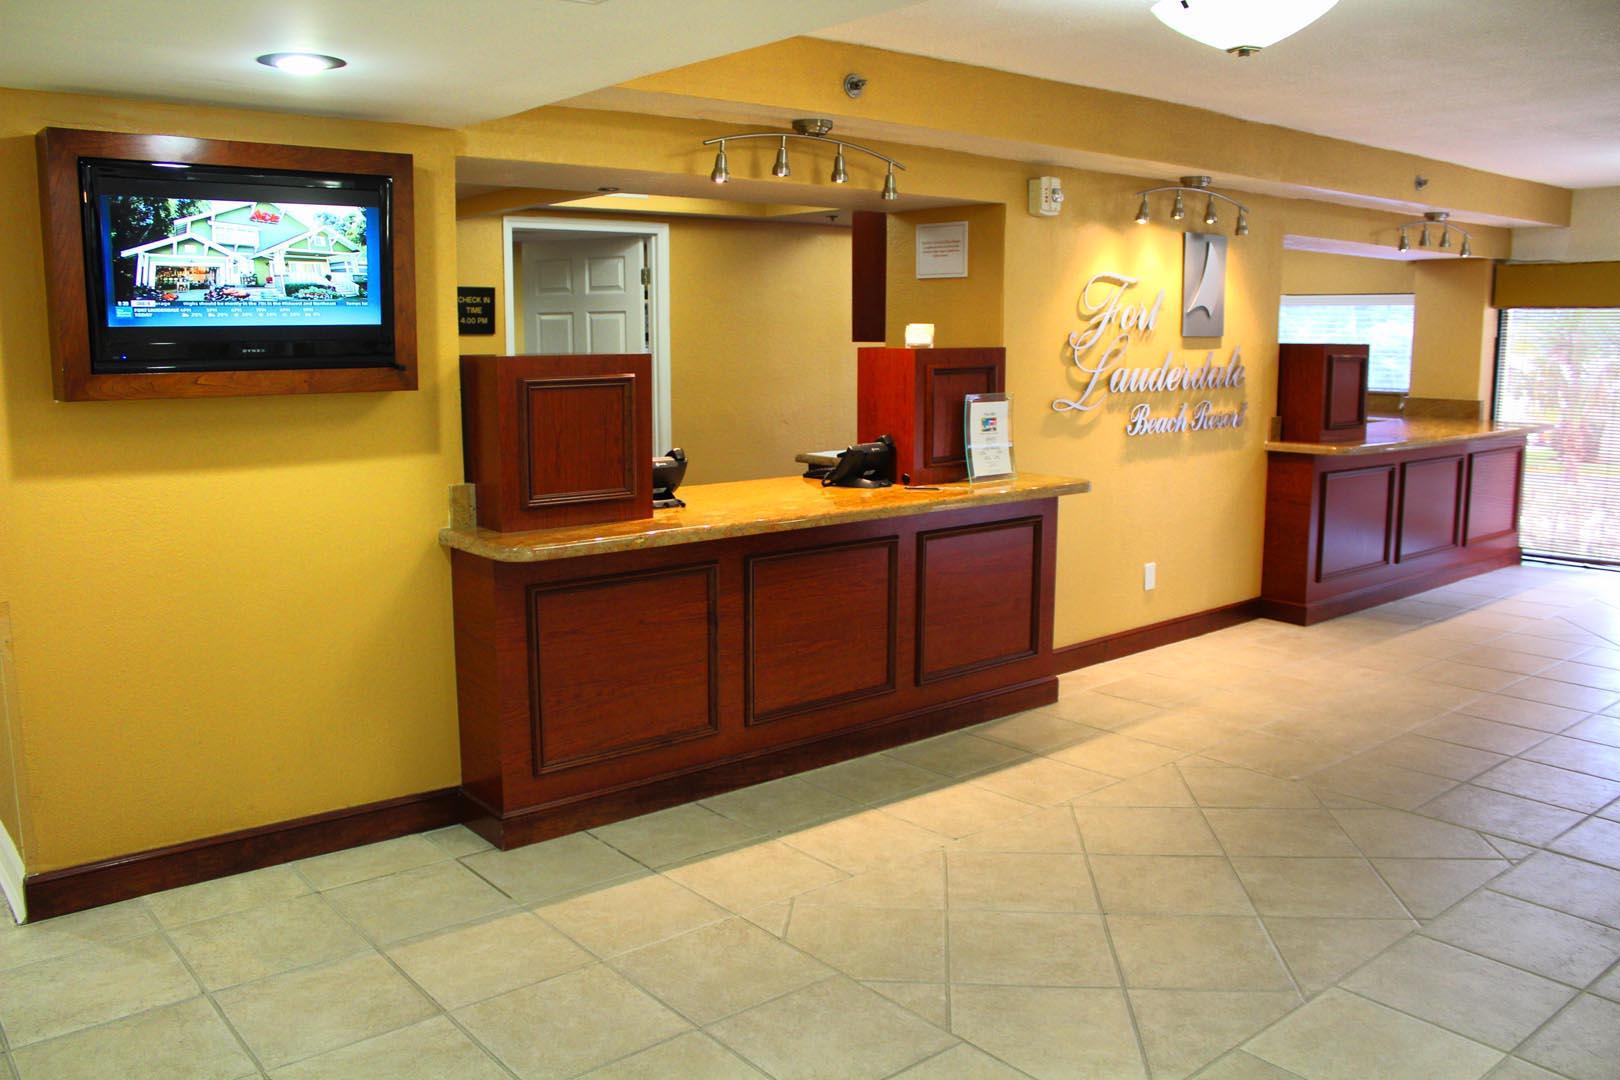 Ft Lauderdale Beach Resort Club Front Desk